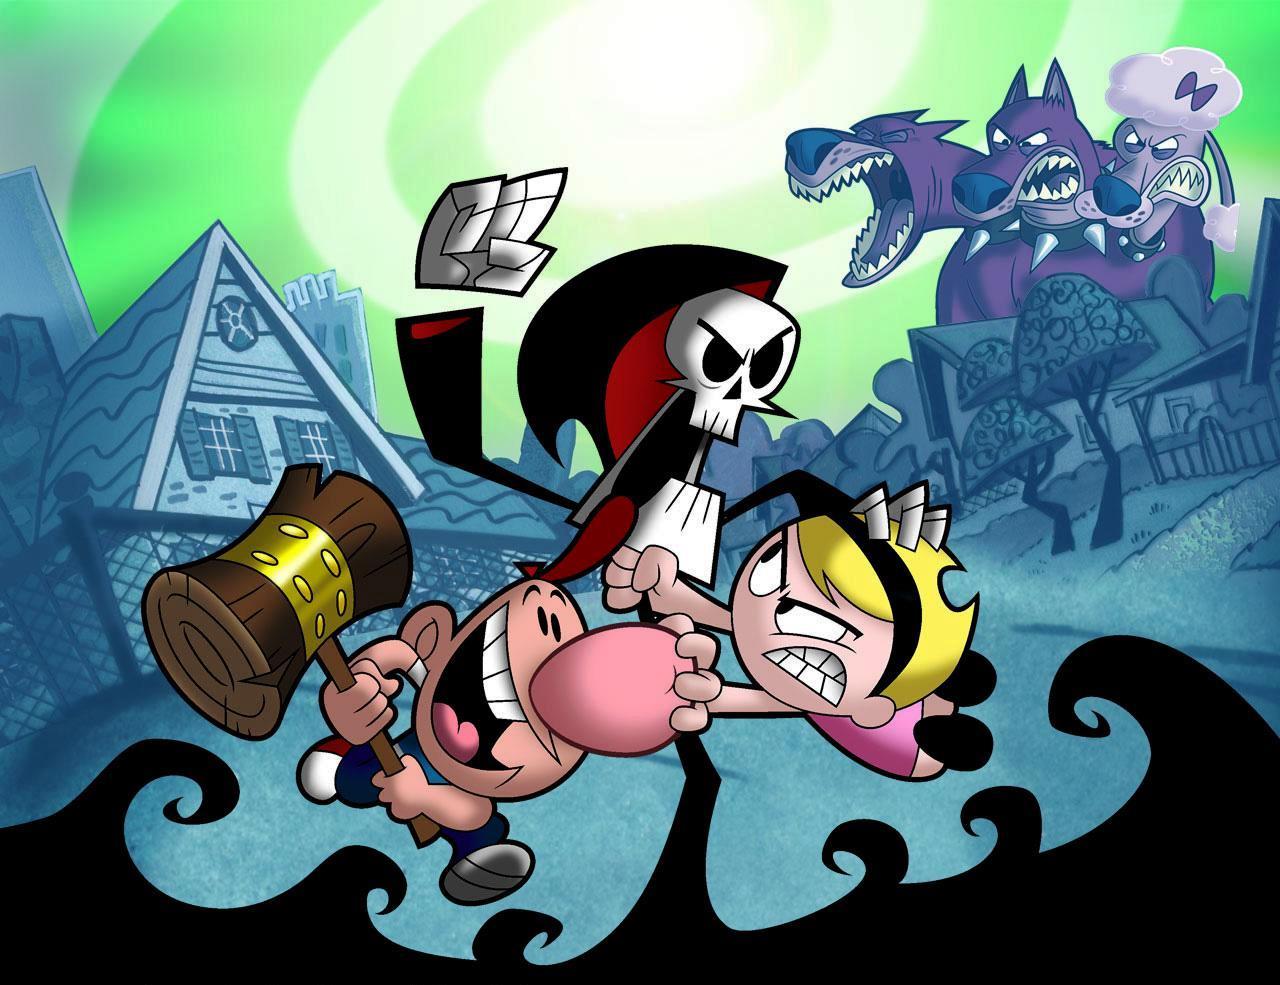 https://i0.wp.com/m.cdn.blog.hu/cl/classic-cartoon/image/The-Grim-Adventures-of-Billy-Mandy-Fight-Wallpaper-Image.jpg